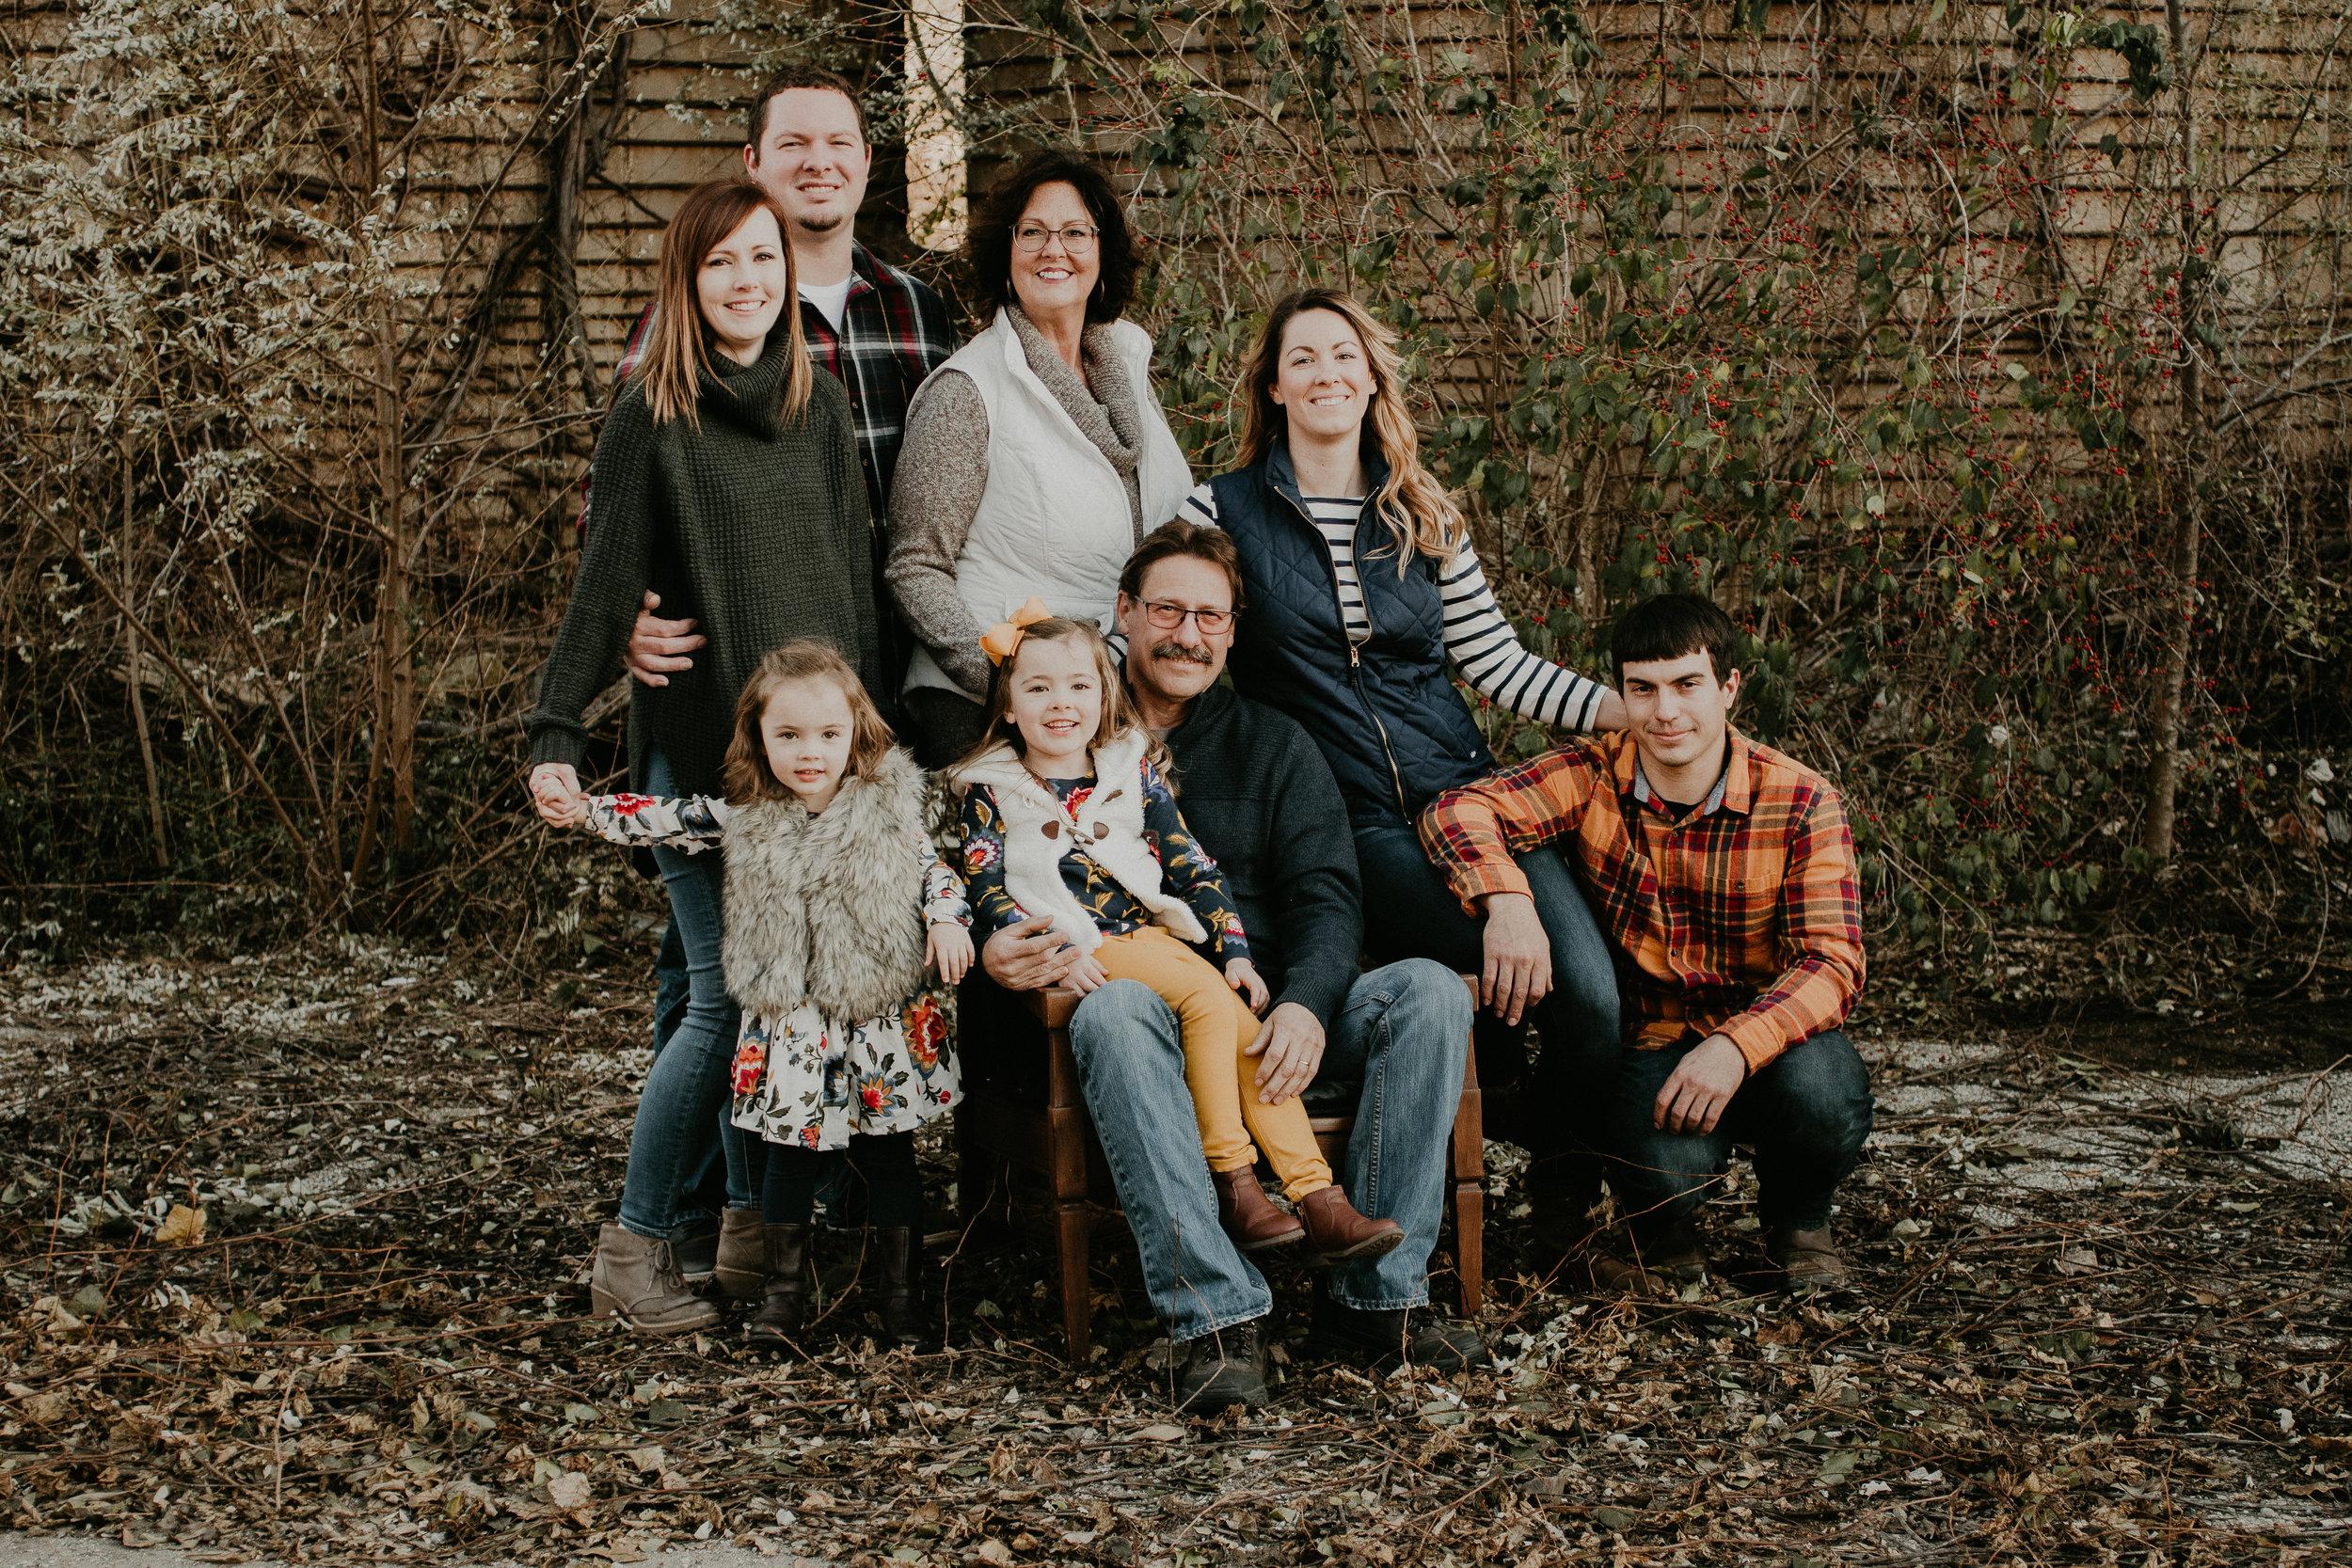 FISCHER - EXTENDED FAMILY